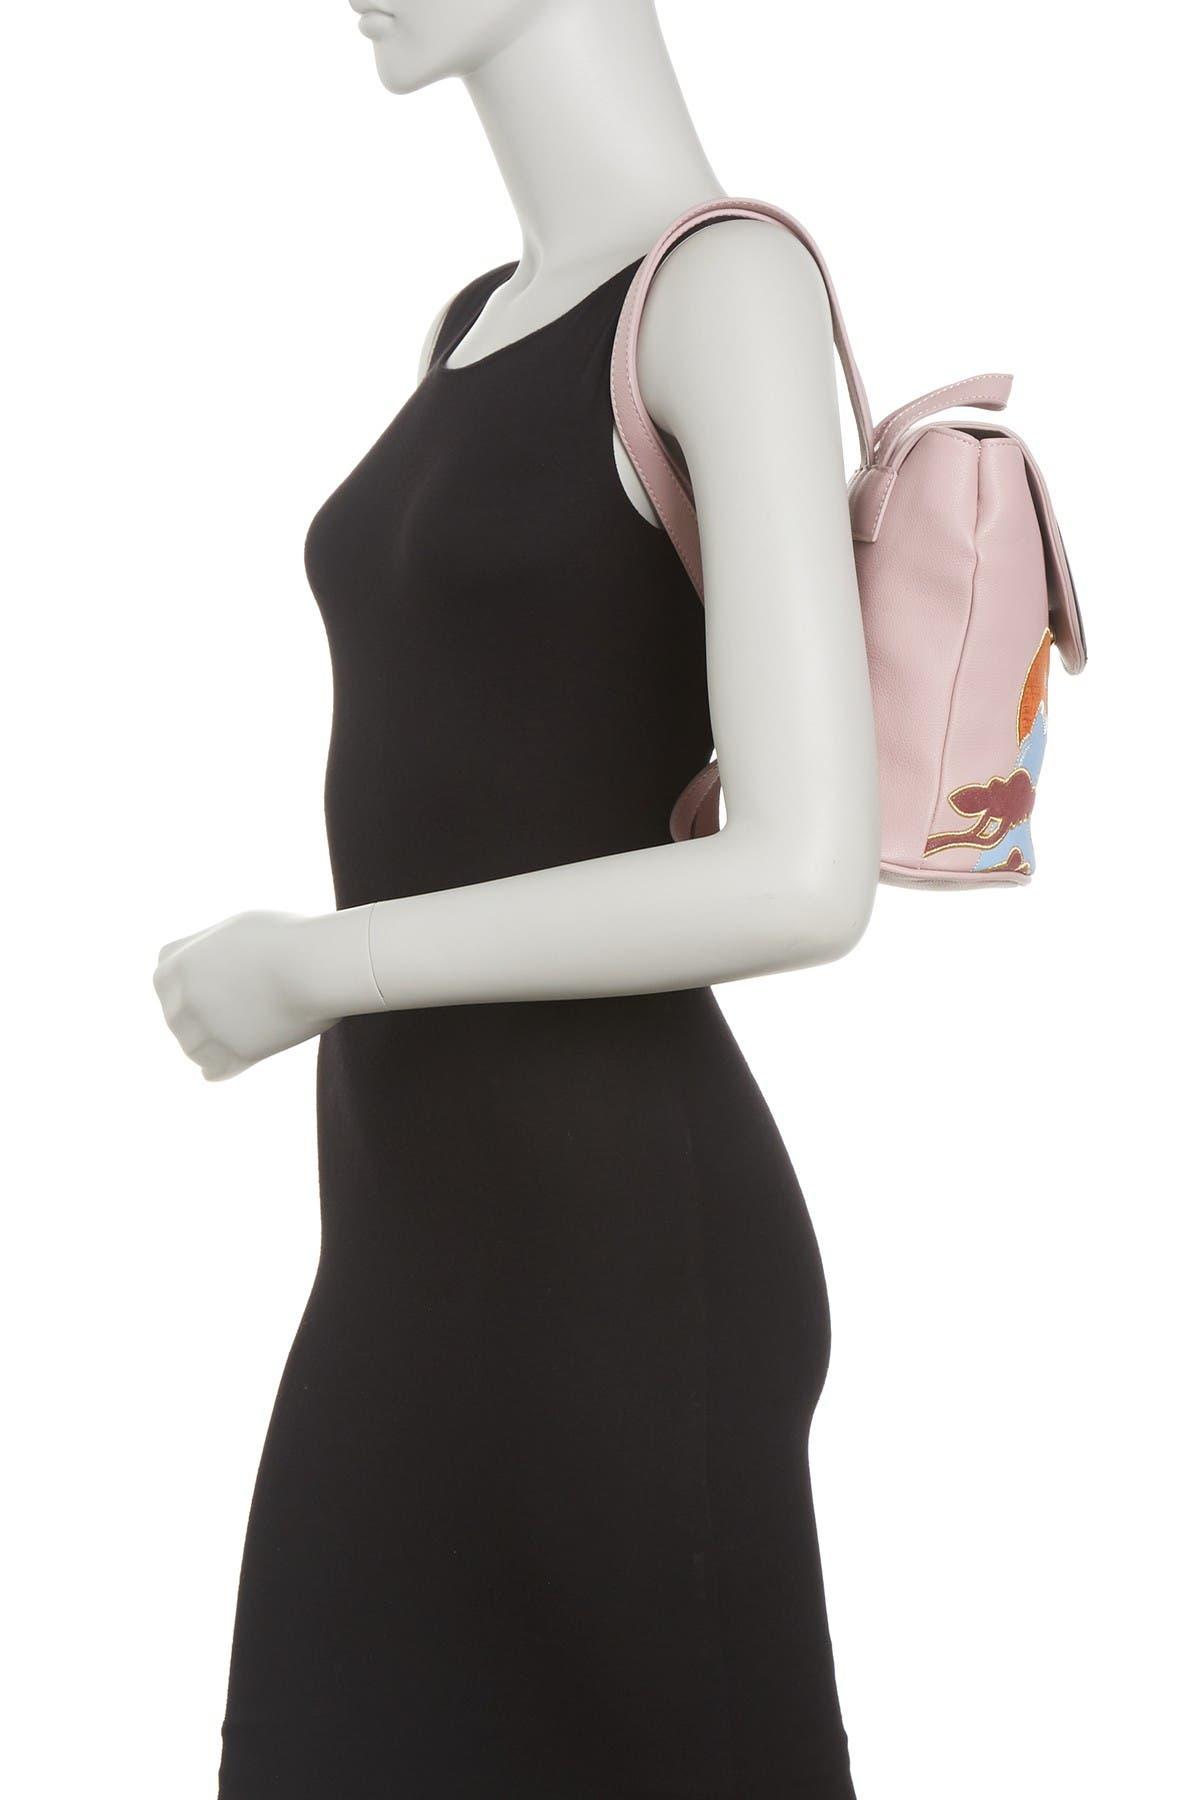 Image of Danielle Nicole Mulan Backpack